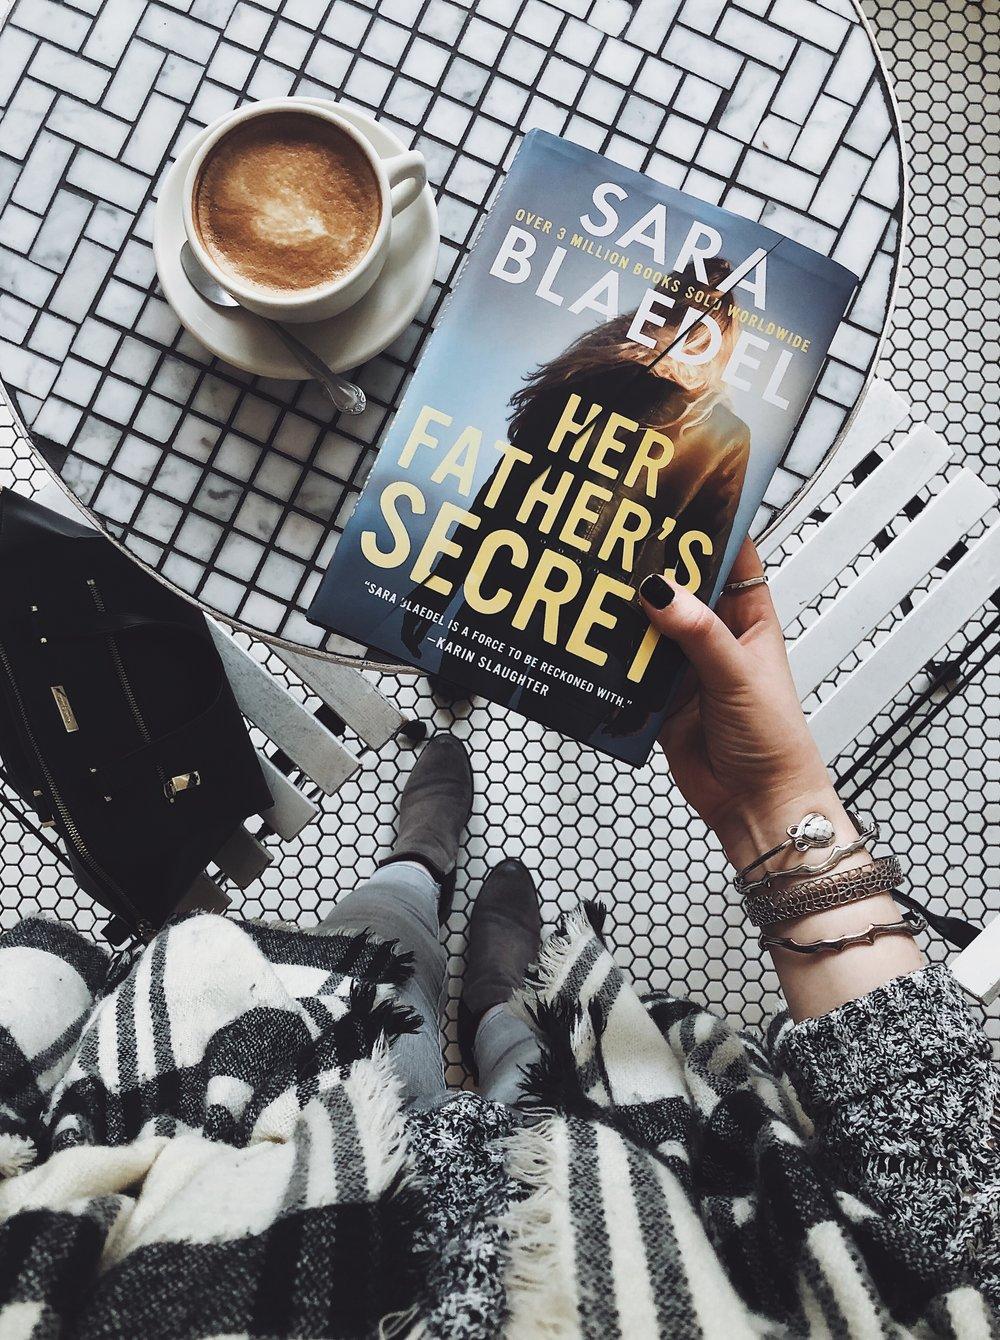 Sara Blaedel Her Father's Secret.JPG